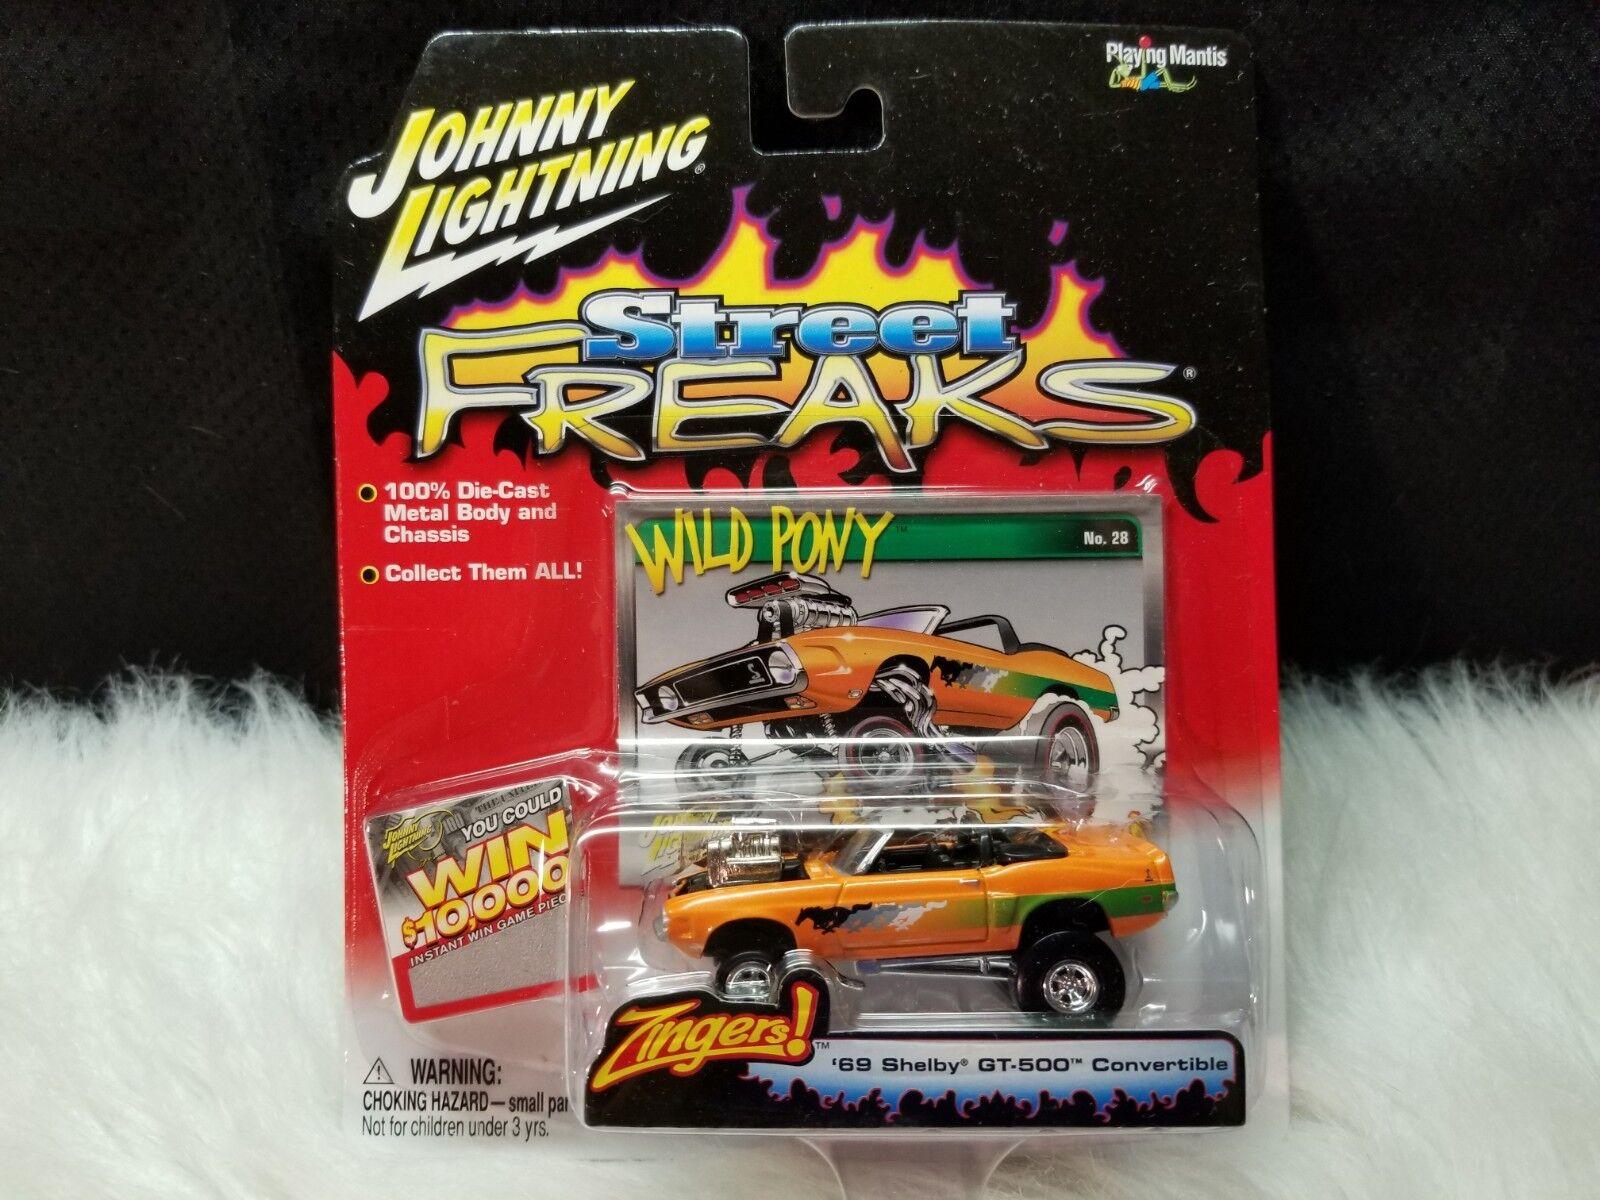 Johnny Lightning Street Freaks 1 64 escala mordaces'69 Shelby GT-500 Converdeible